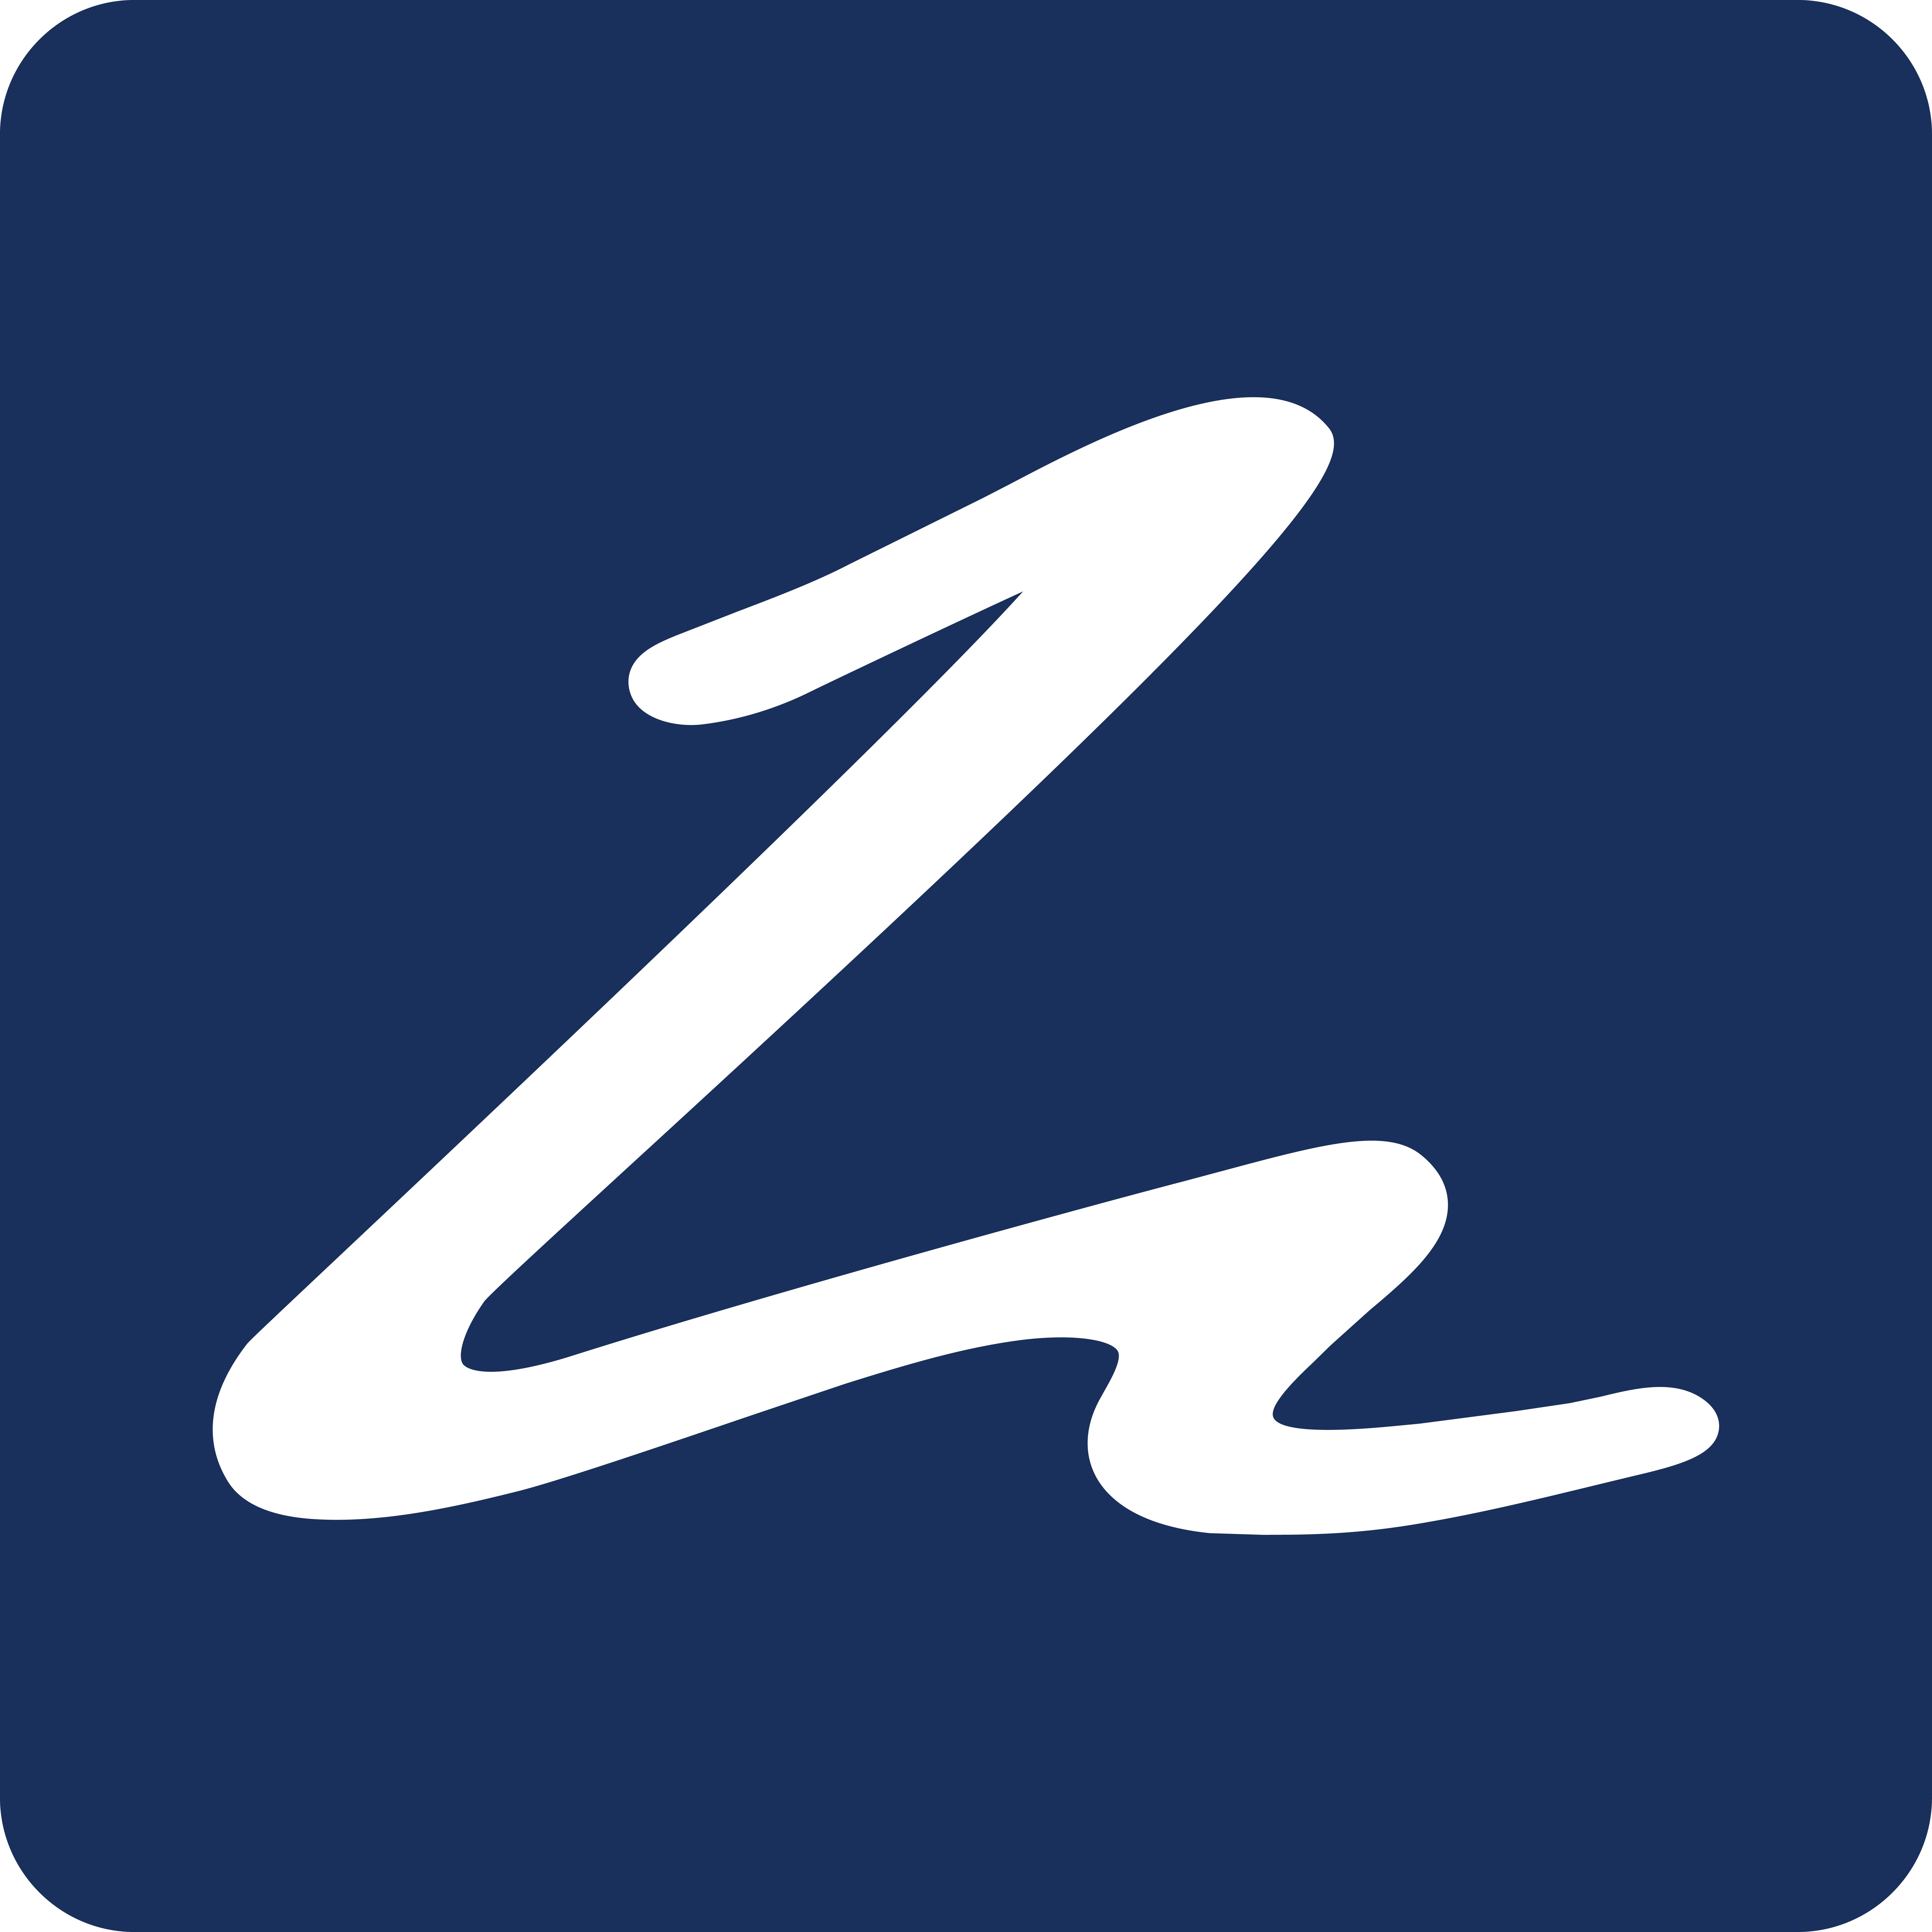 Zaui logo